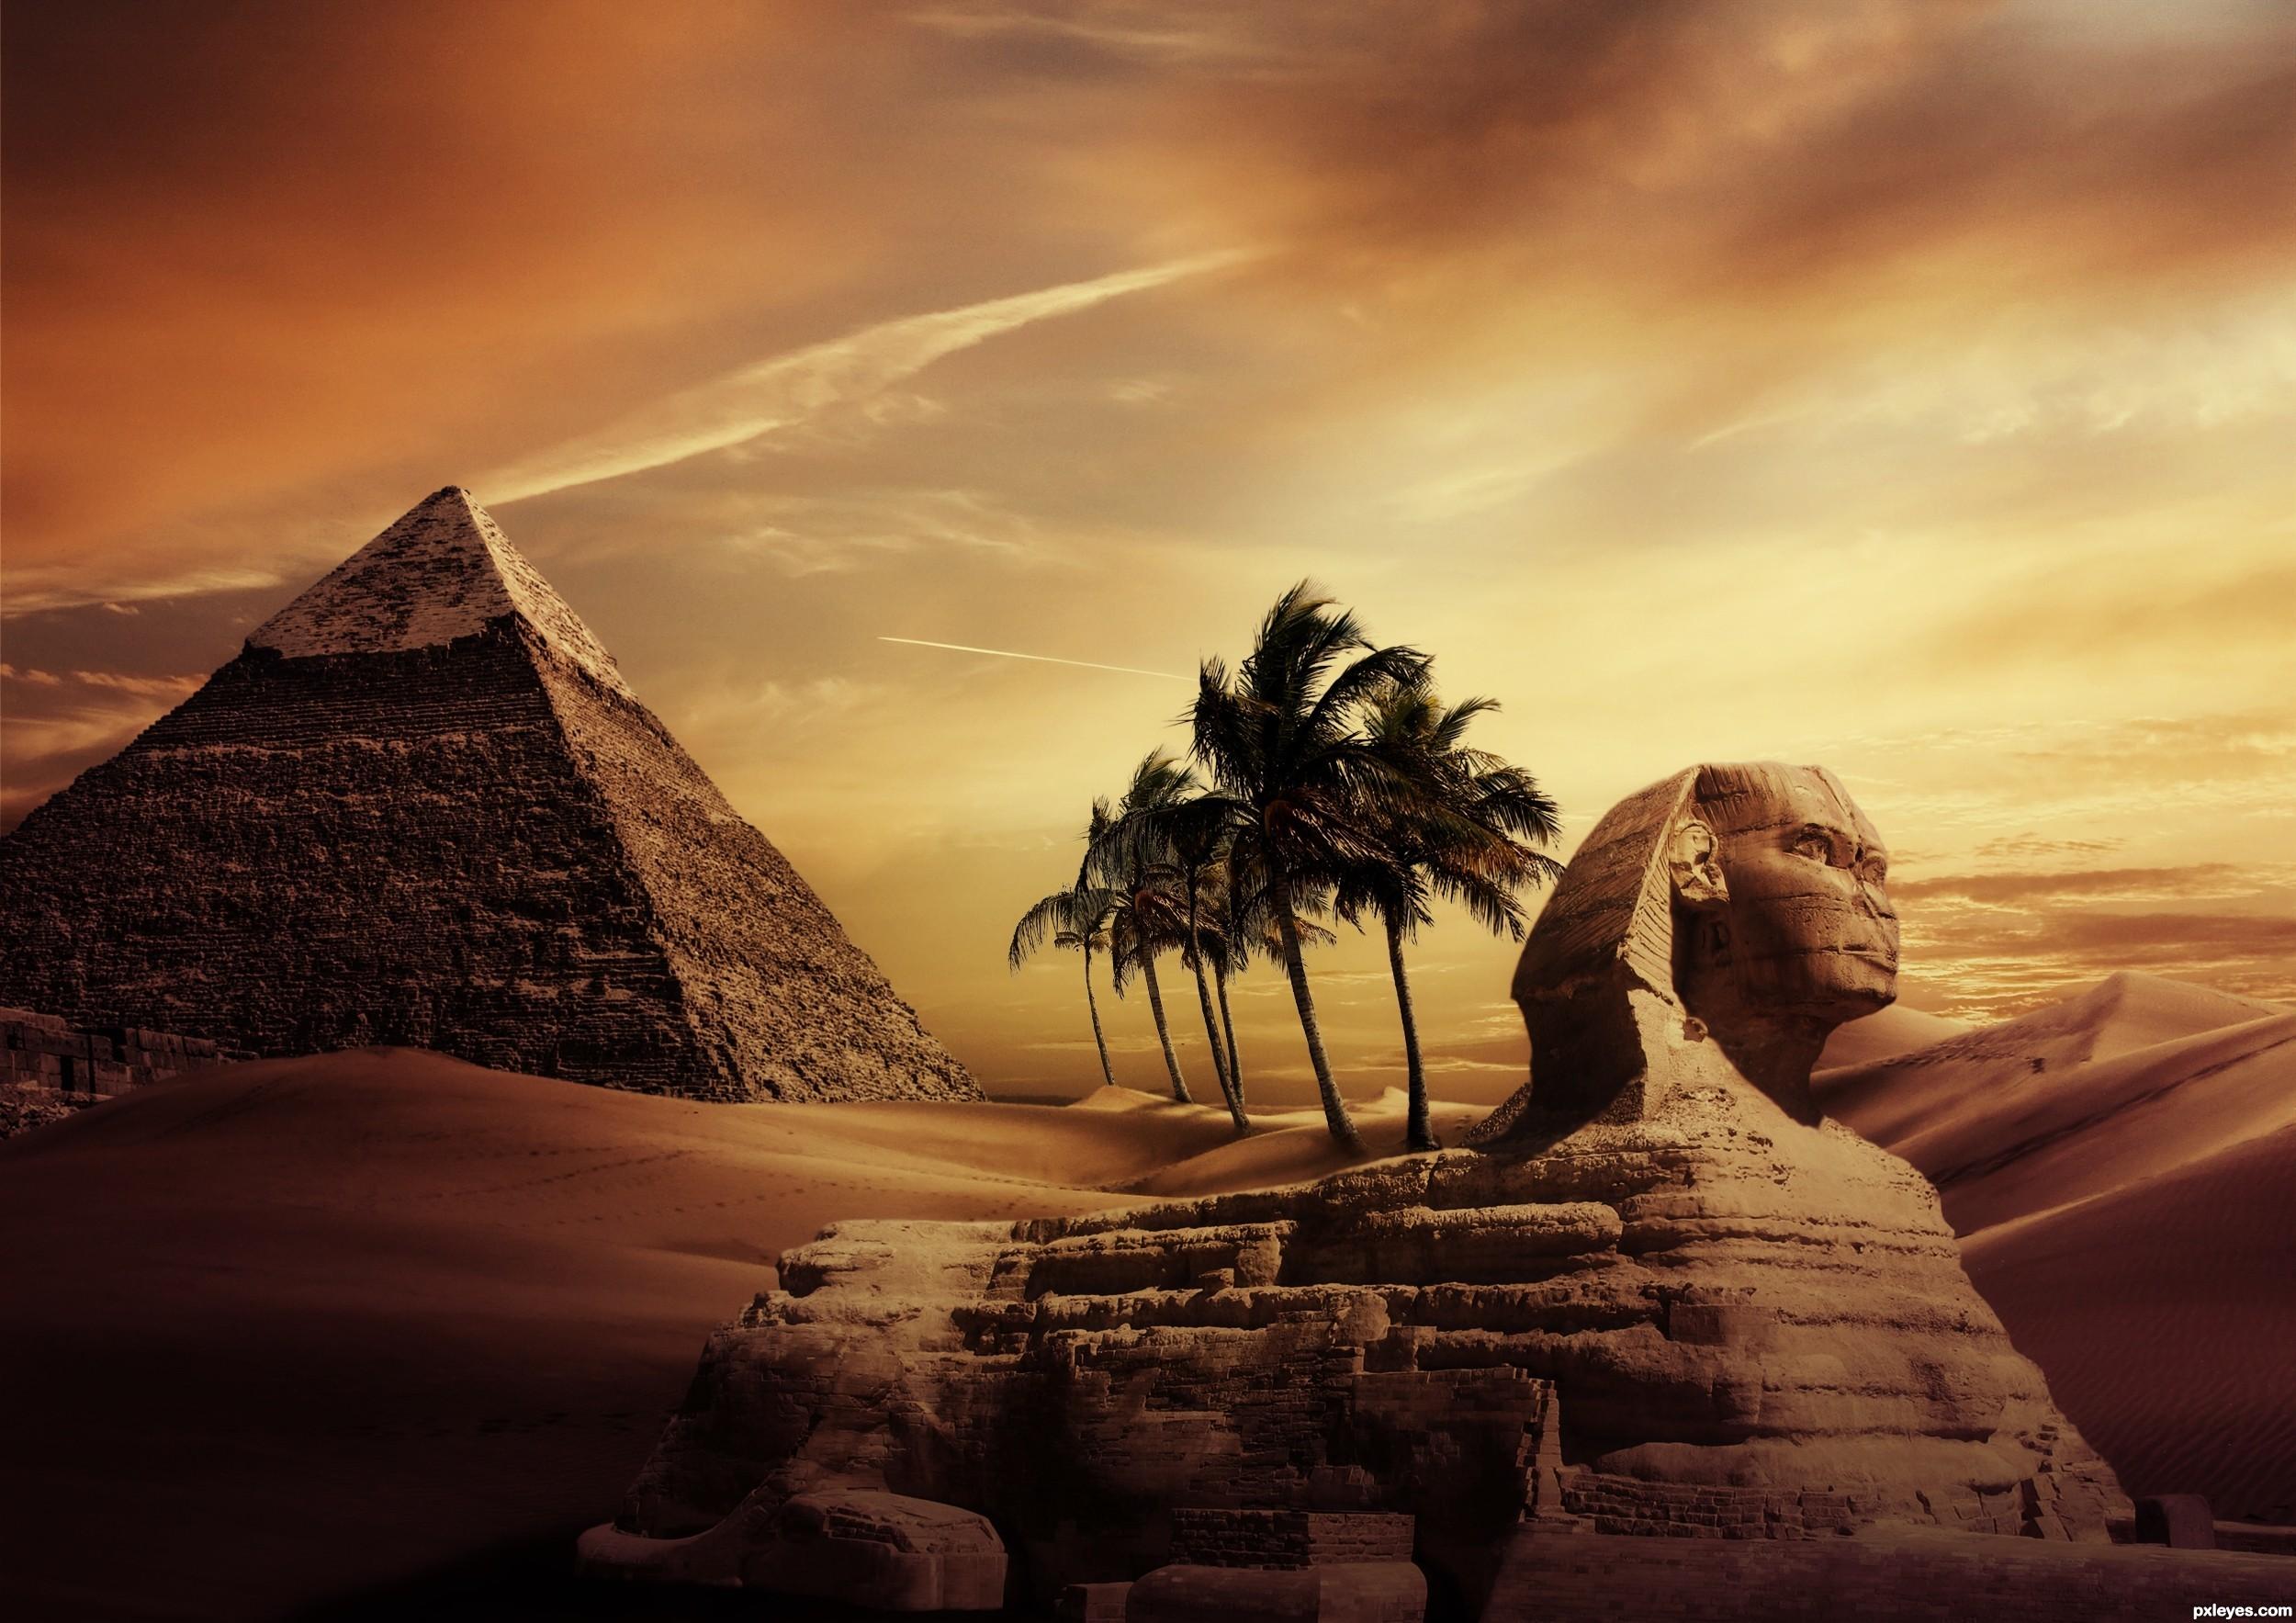 Egypt Pyramids Hd Wallpapers Ancient Egypt Wallpaper 183 ①